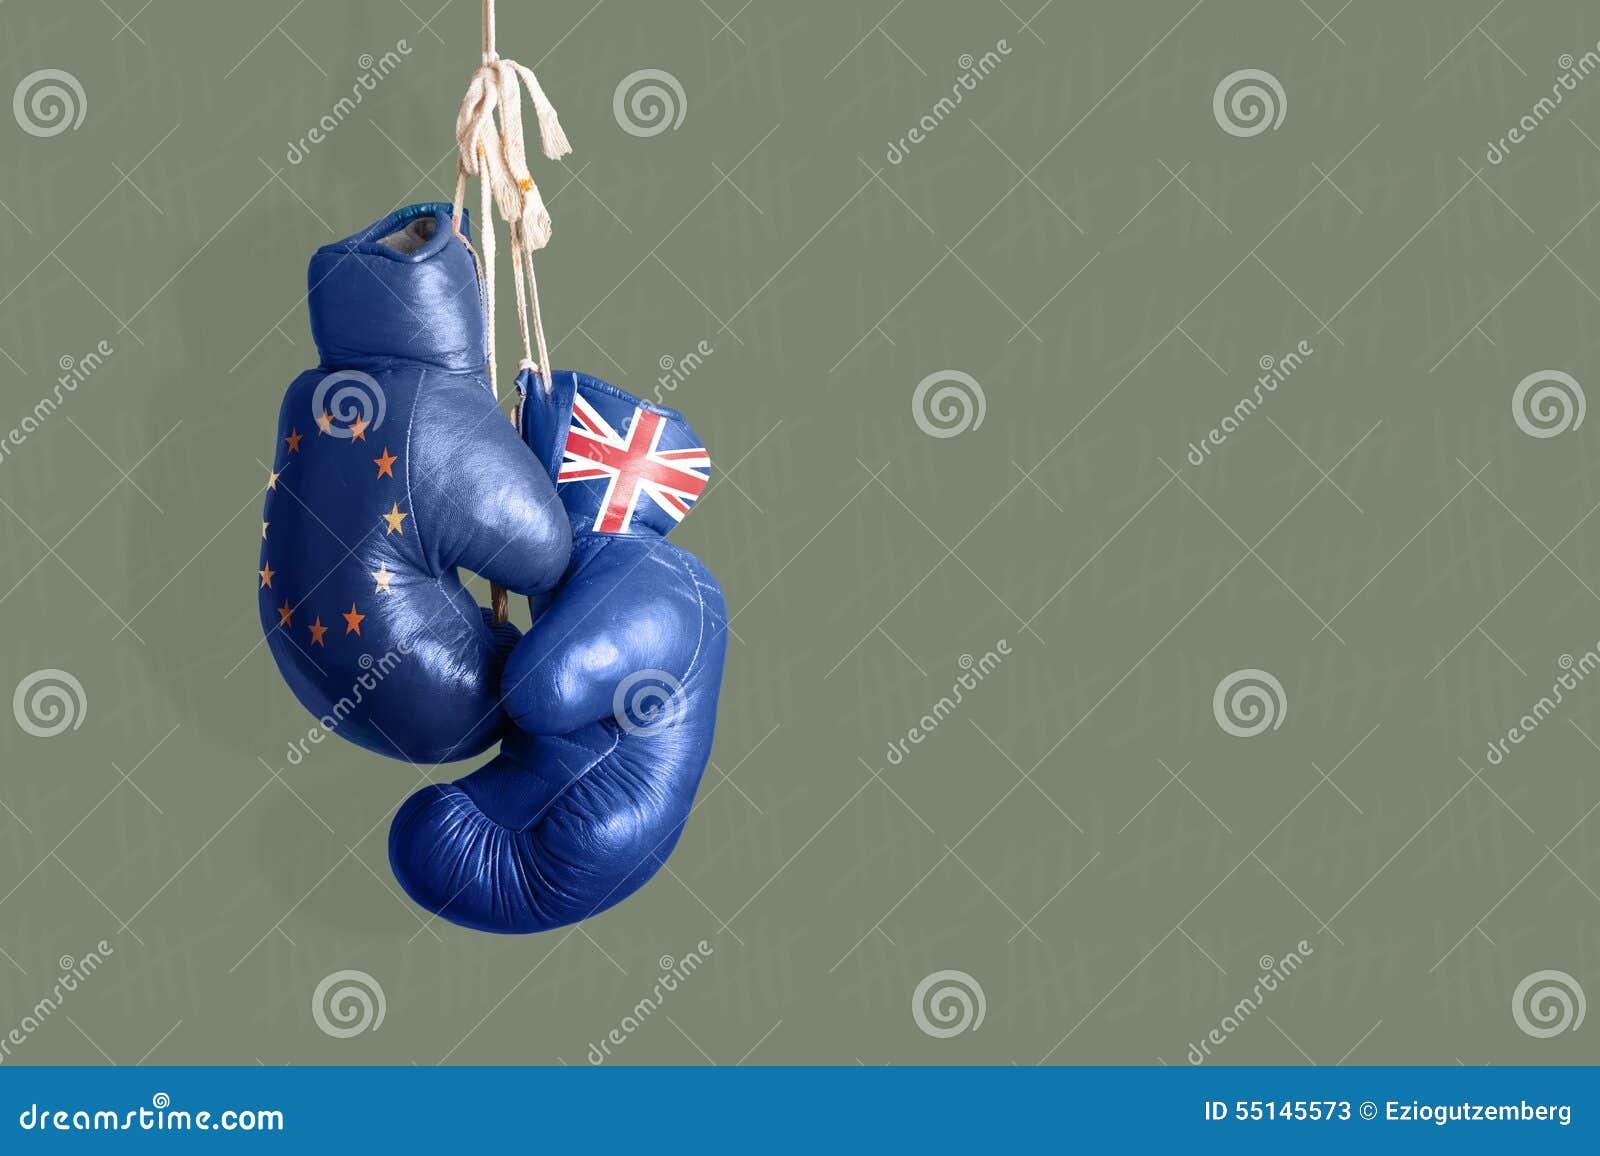 Brexit, símbolo del referéndum Reino Unido contra la UE